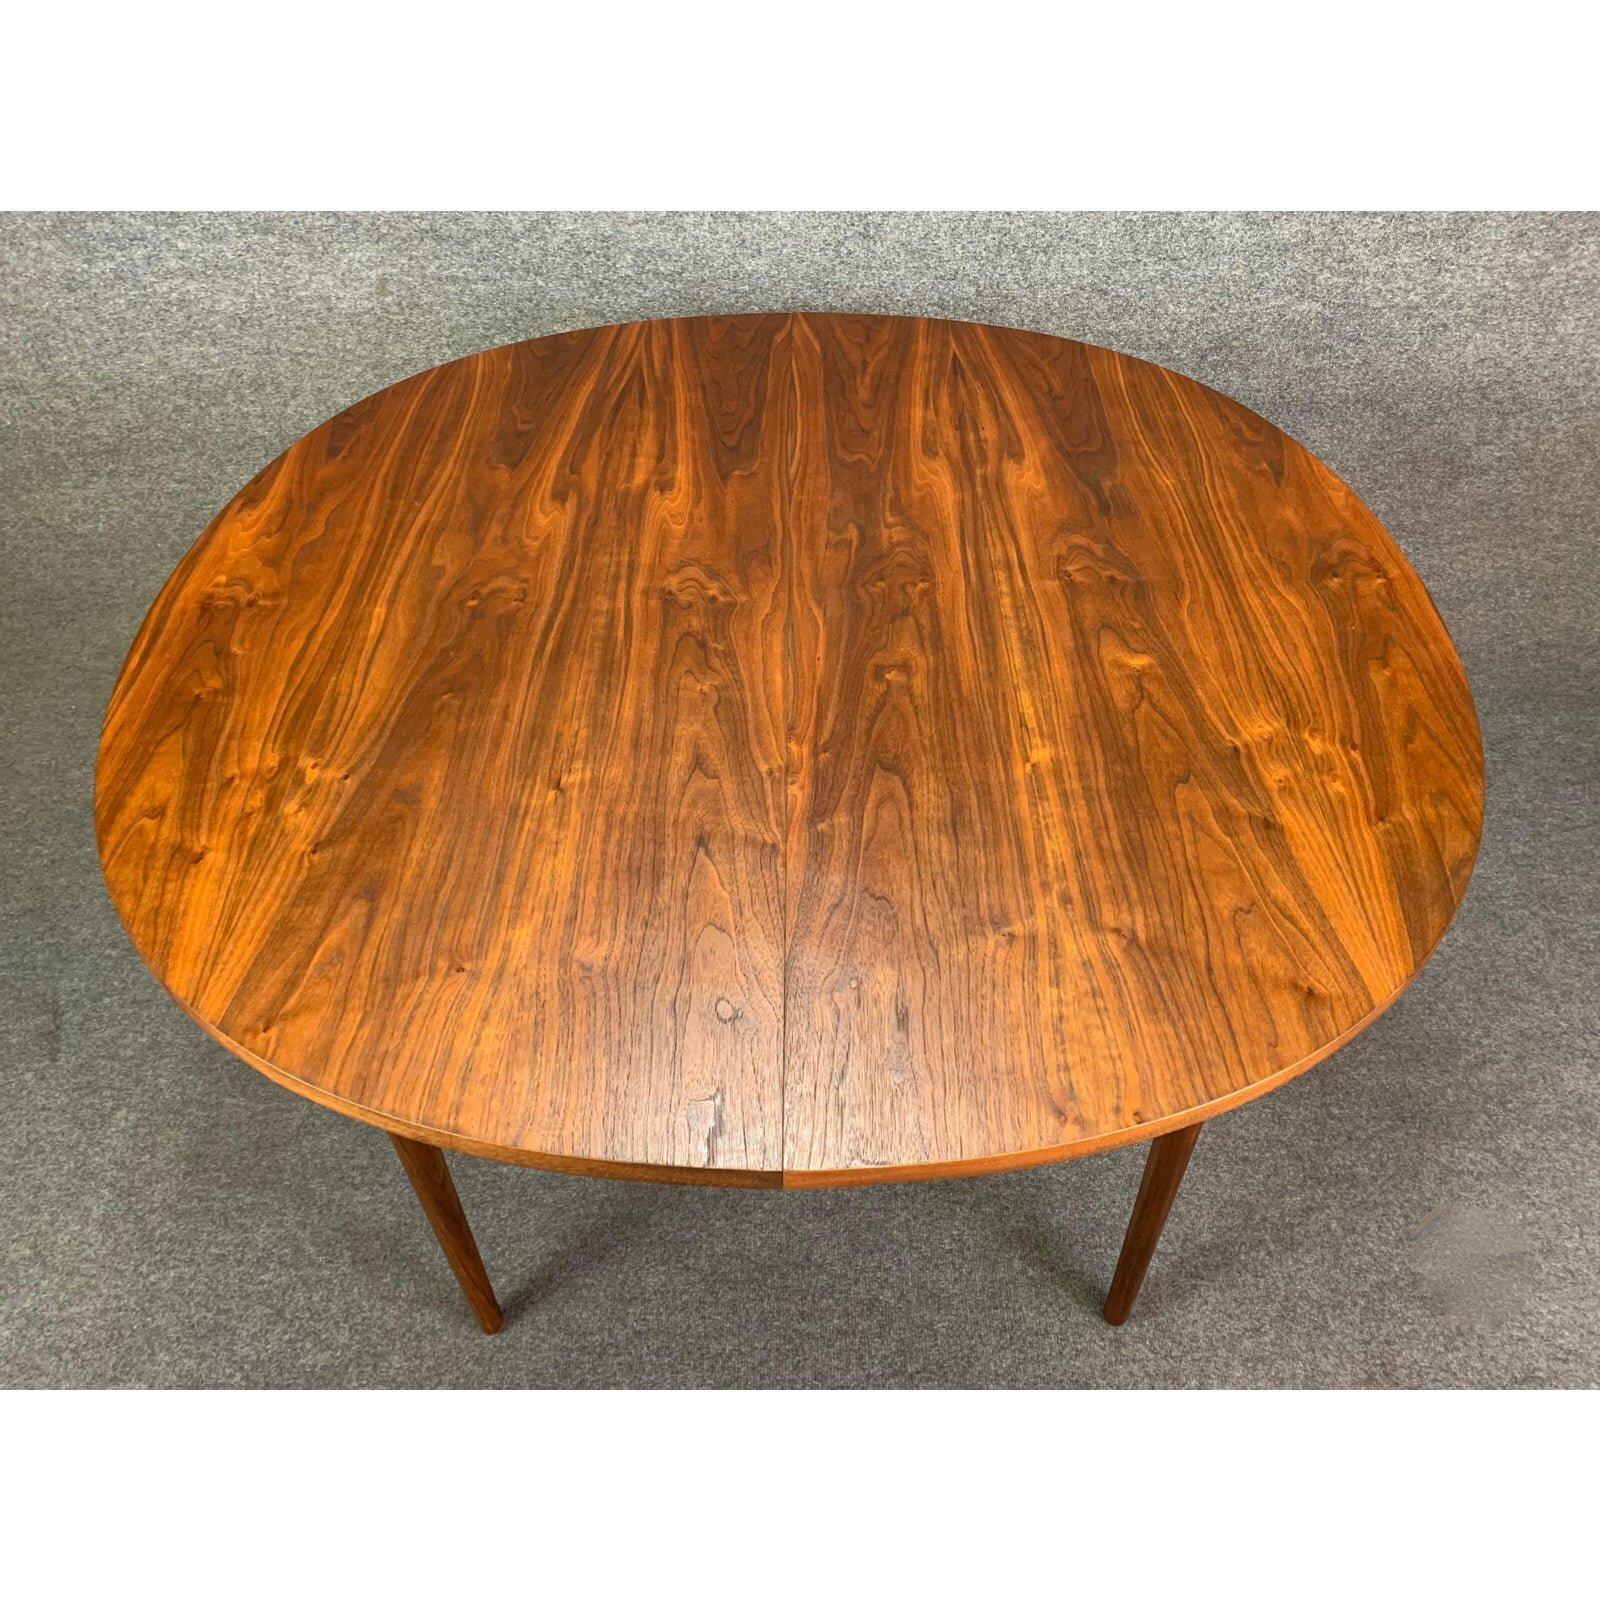 Vintage Mid Century Modern Walnut Declaration Dining Table By Drexel Aymerick